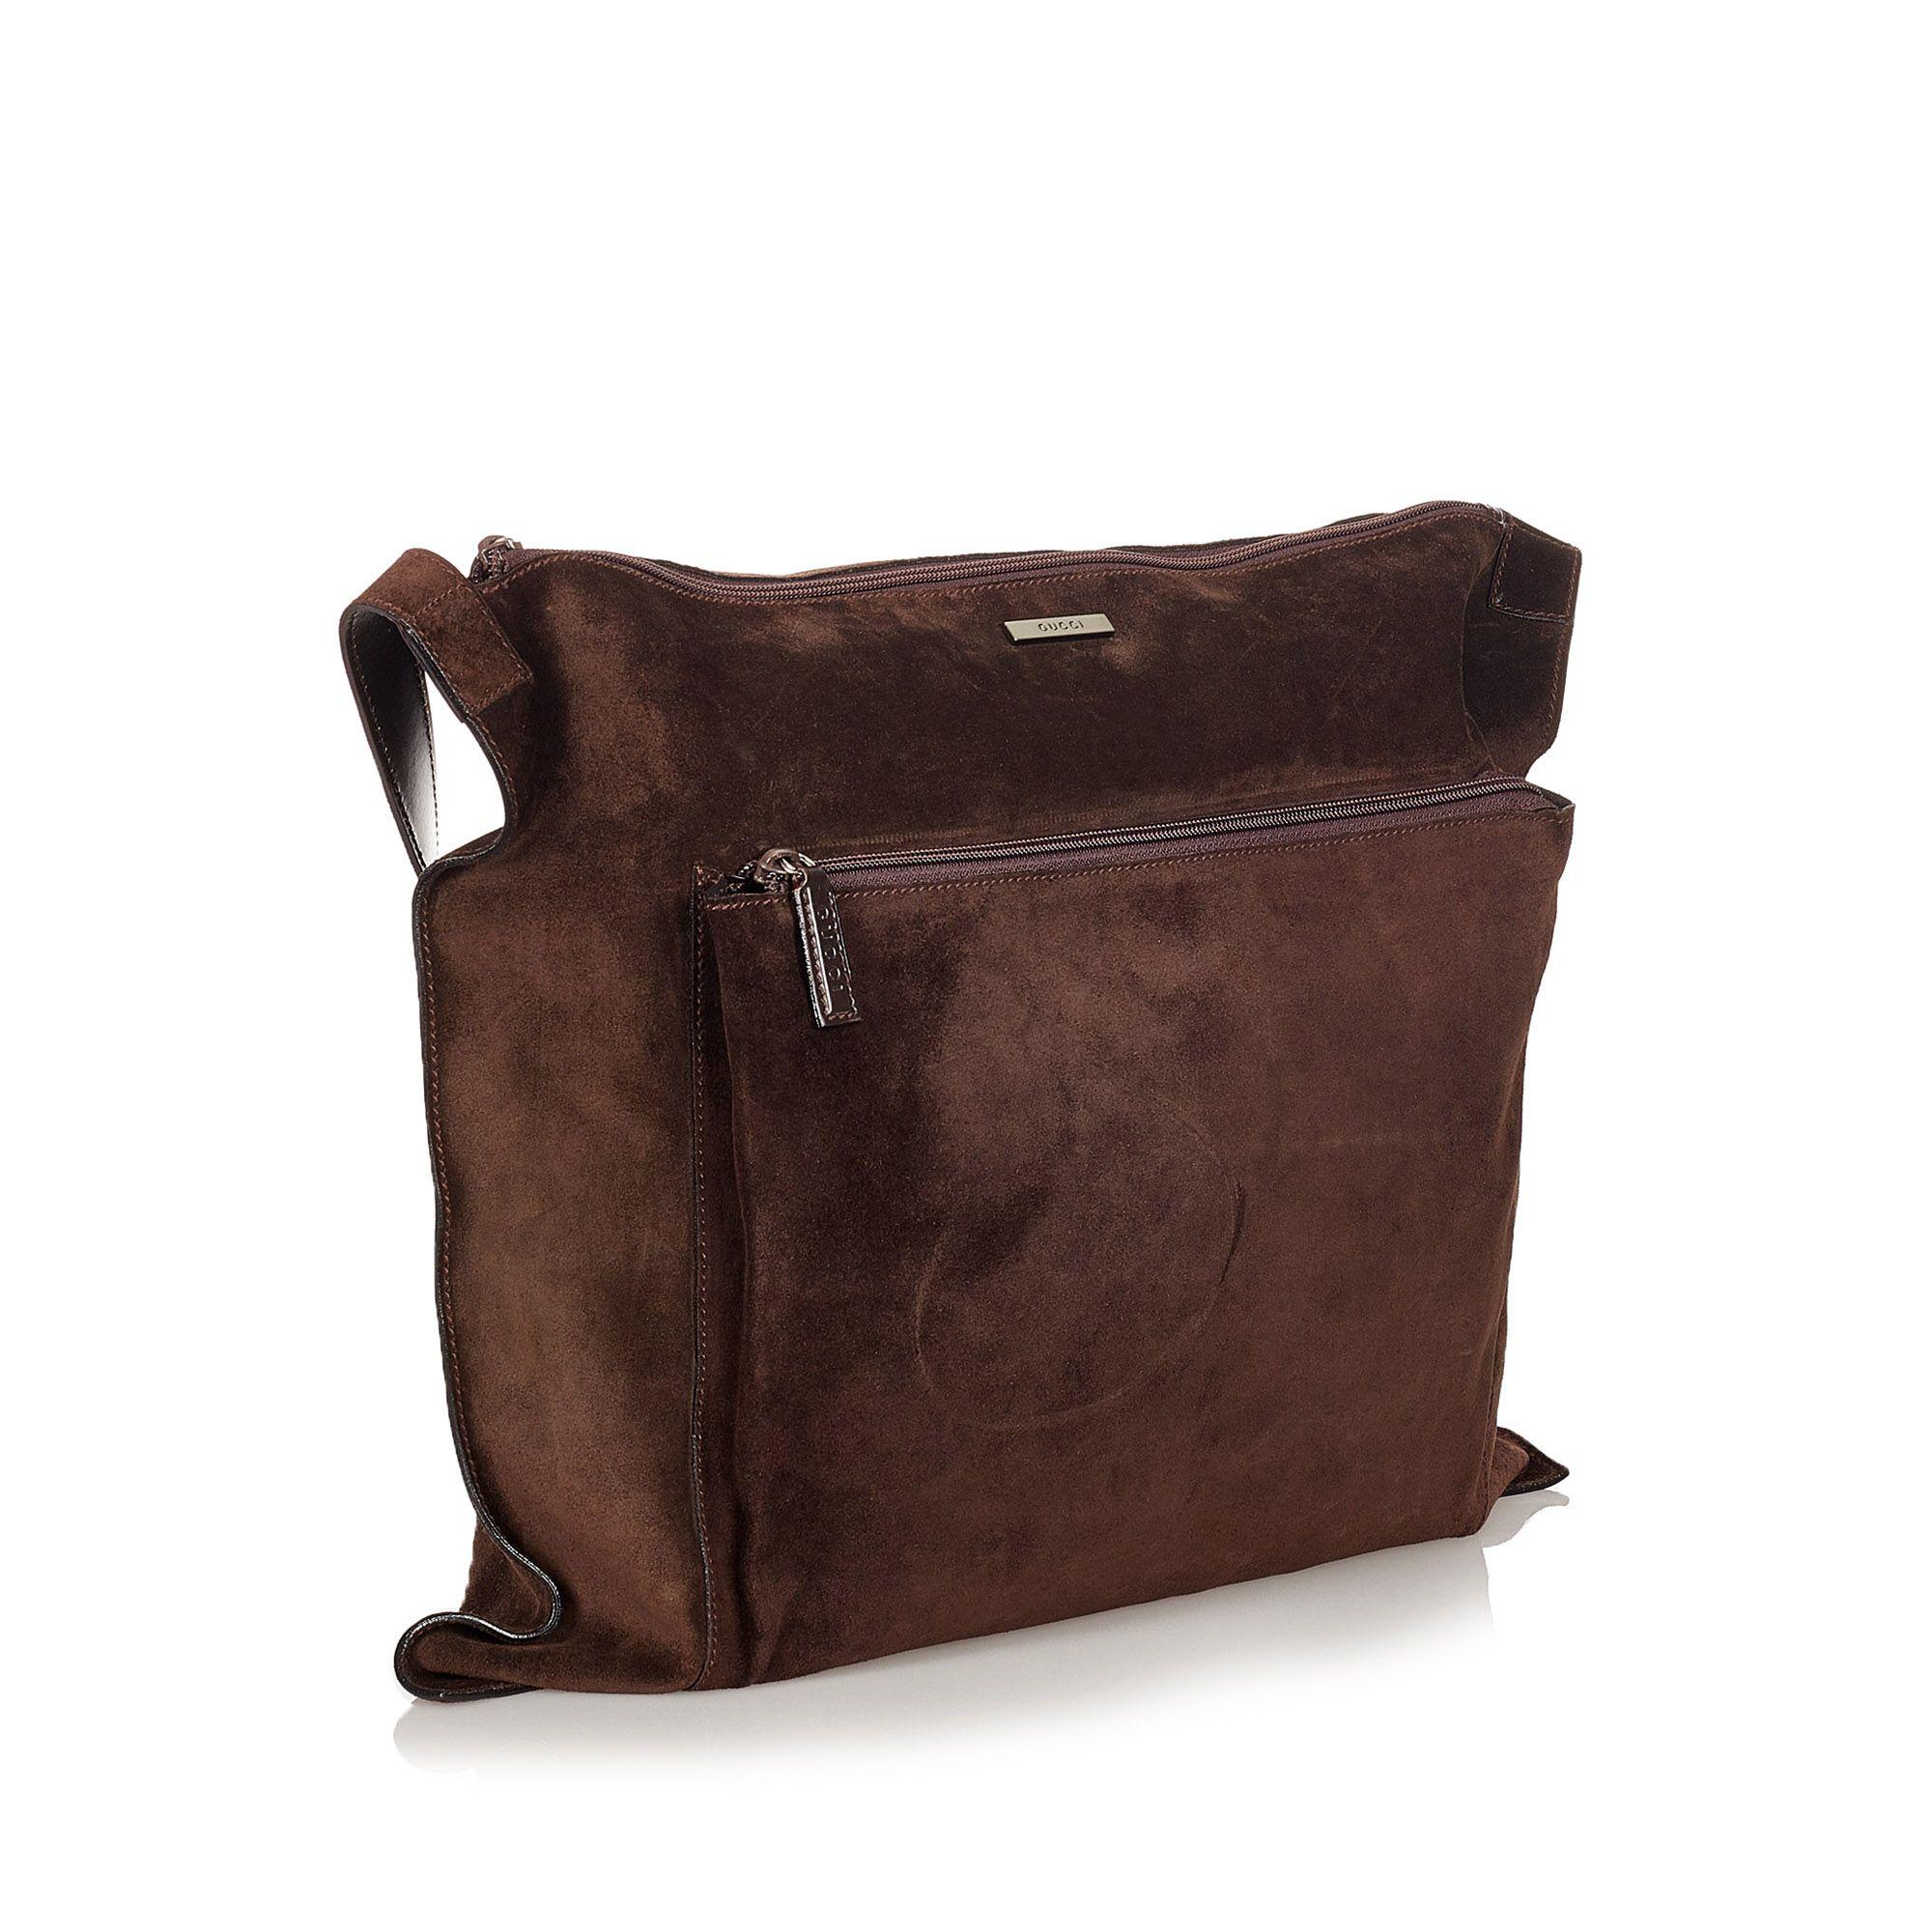 Vintage Gucci Suede Travel Bag Brown